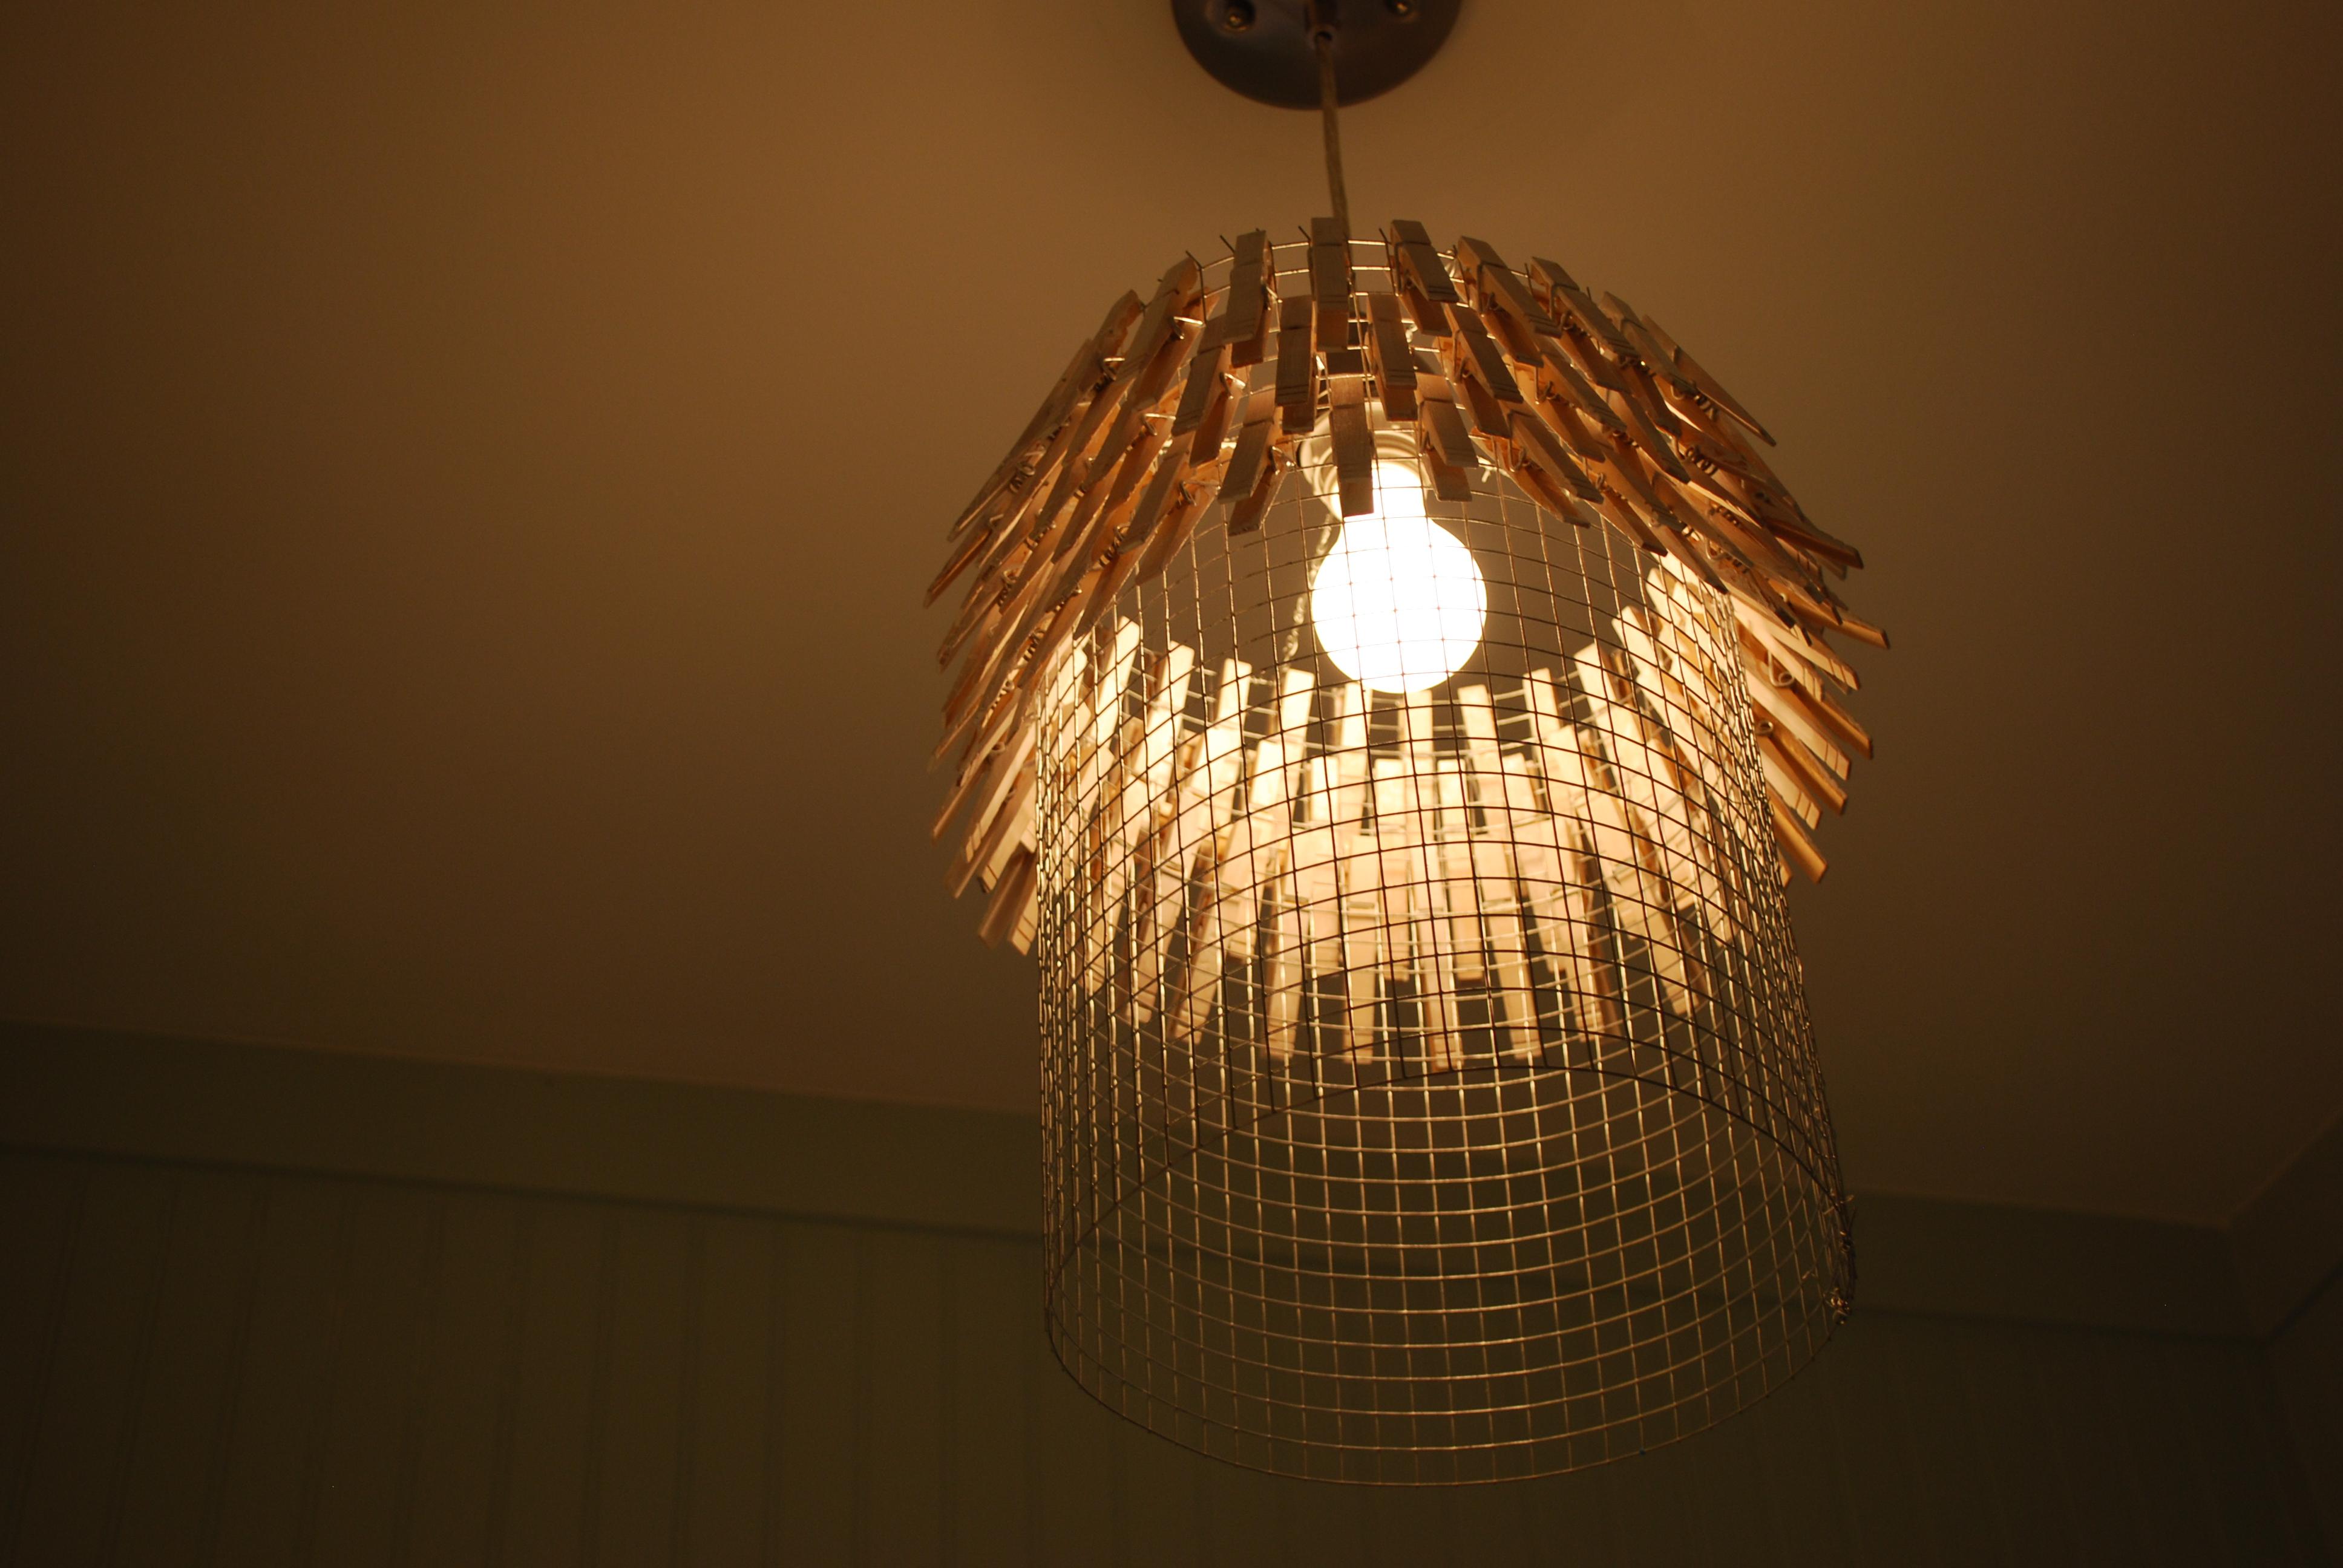 Diy Laundry Room Lamp Shade